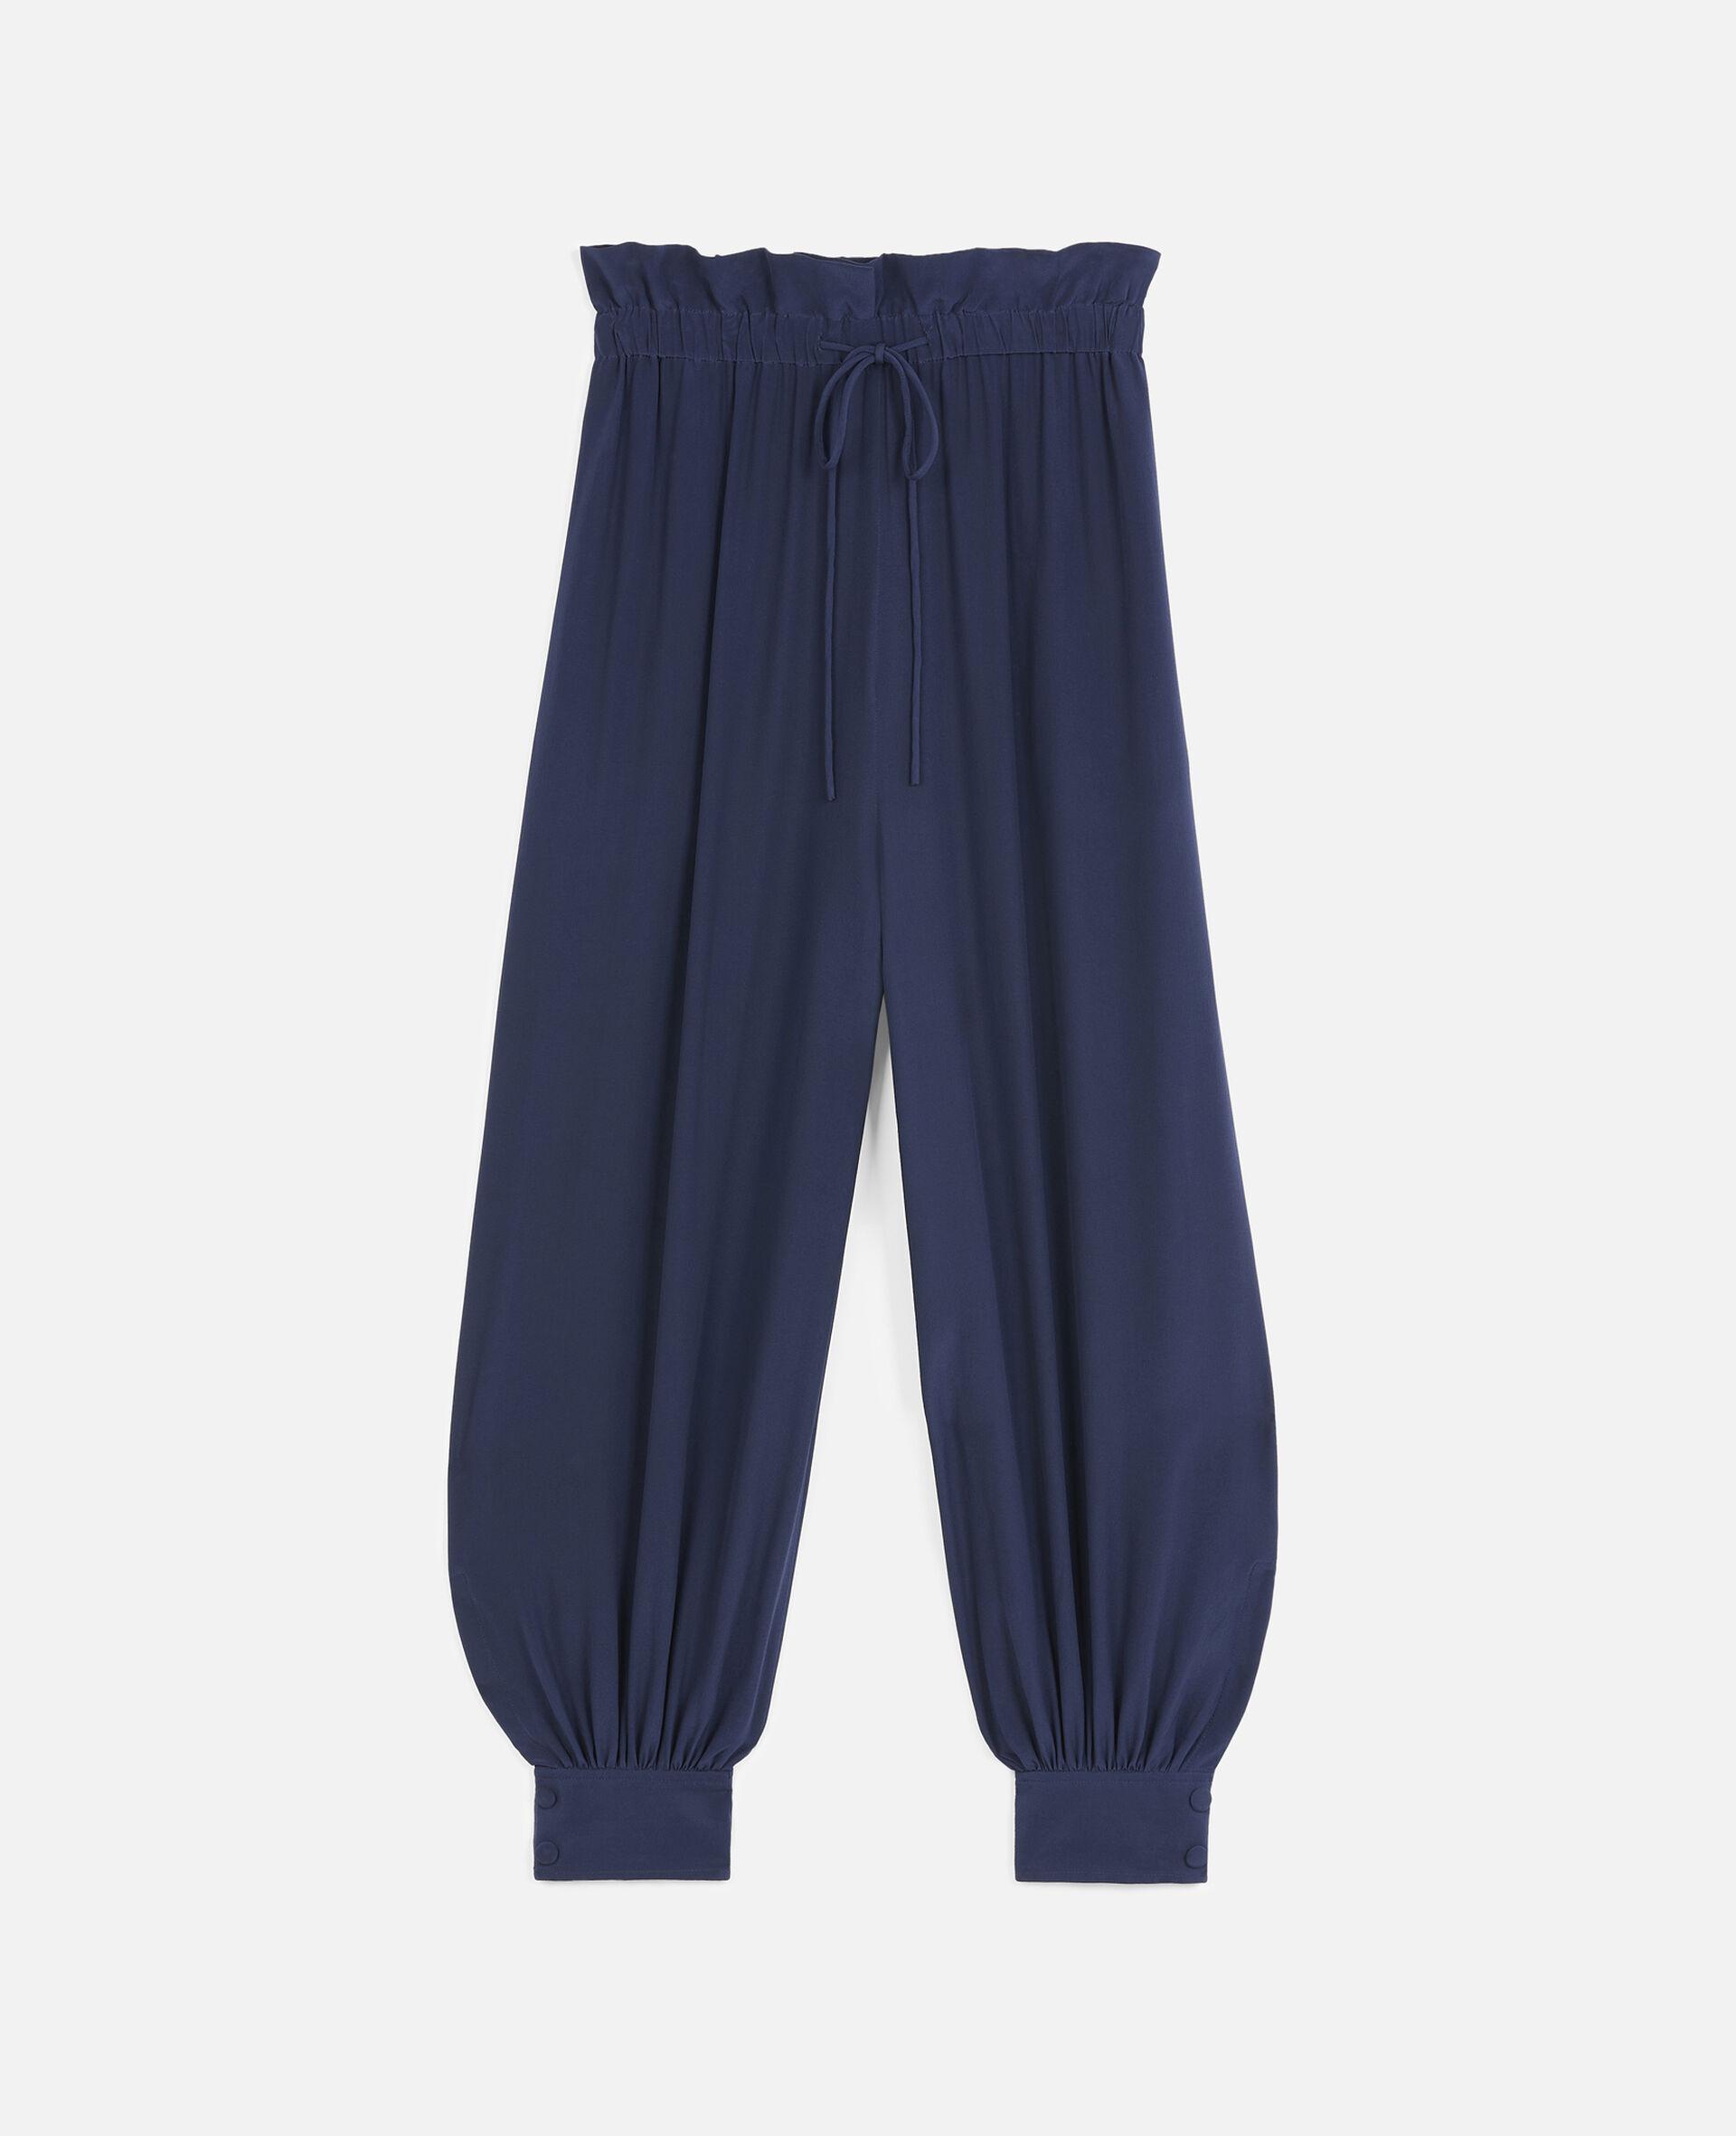 Lauryn 真丝裤装-蓝色-large image number 0